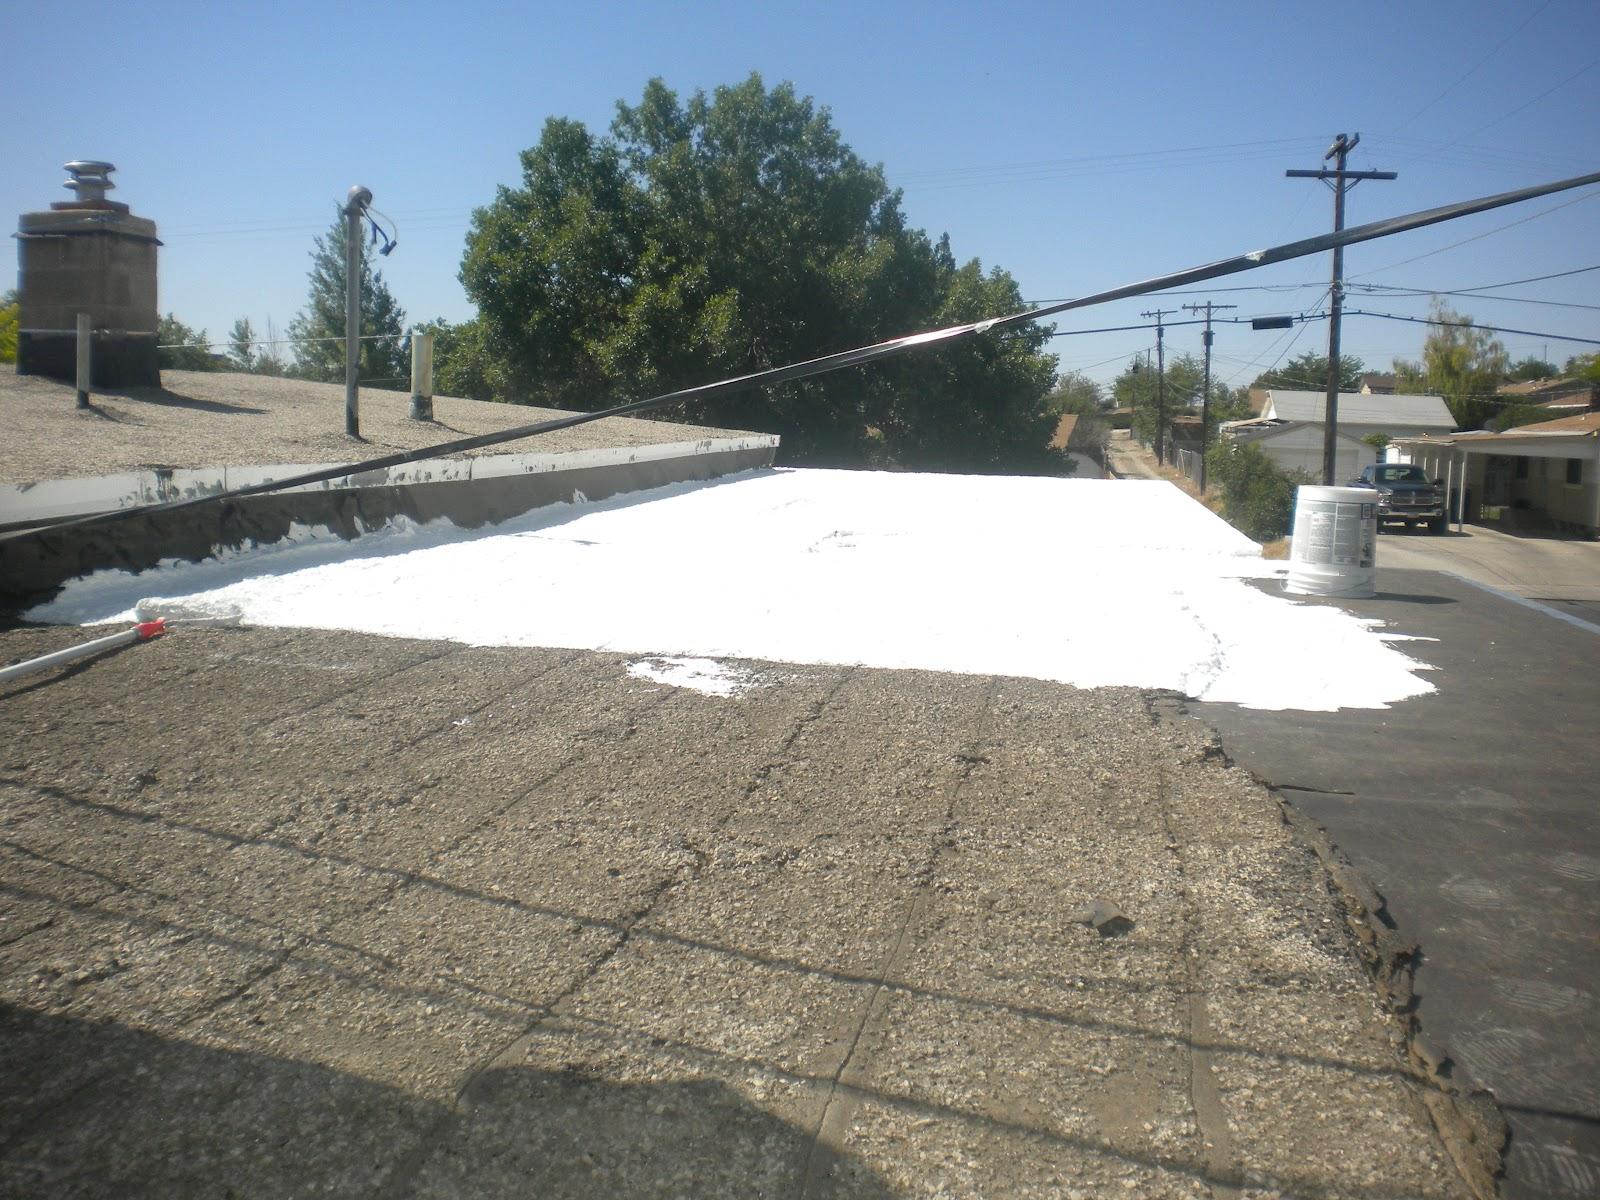 Thomas And Jennifer Carport Roof Repair